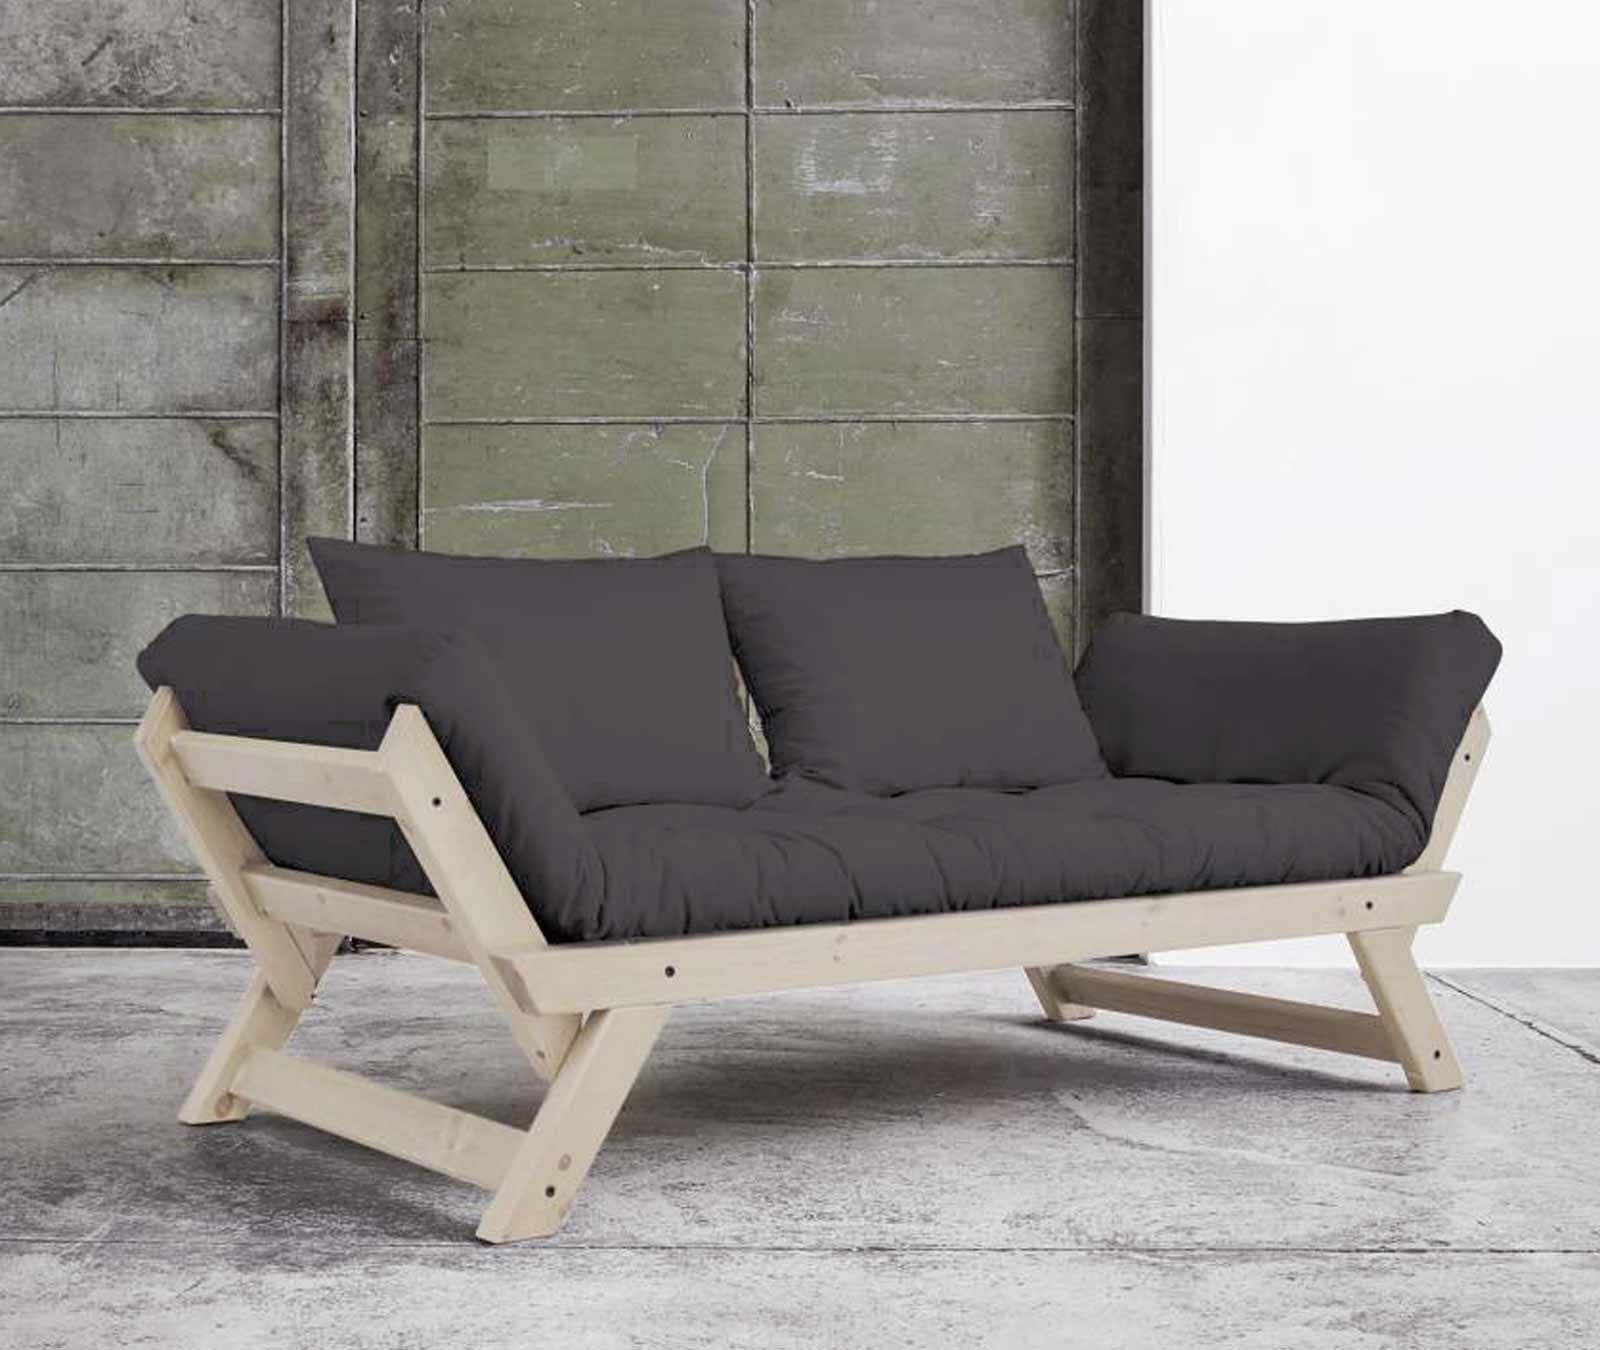 schlafsofa bebop sofa kiefer natur lackiert abklappbar von karup. Black Bedroom Furniture Sets. Home Design Ideas